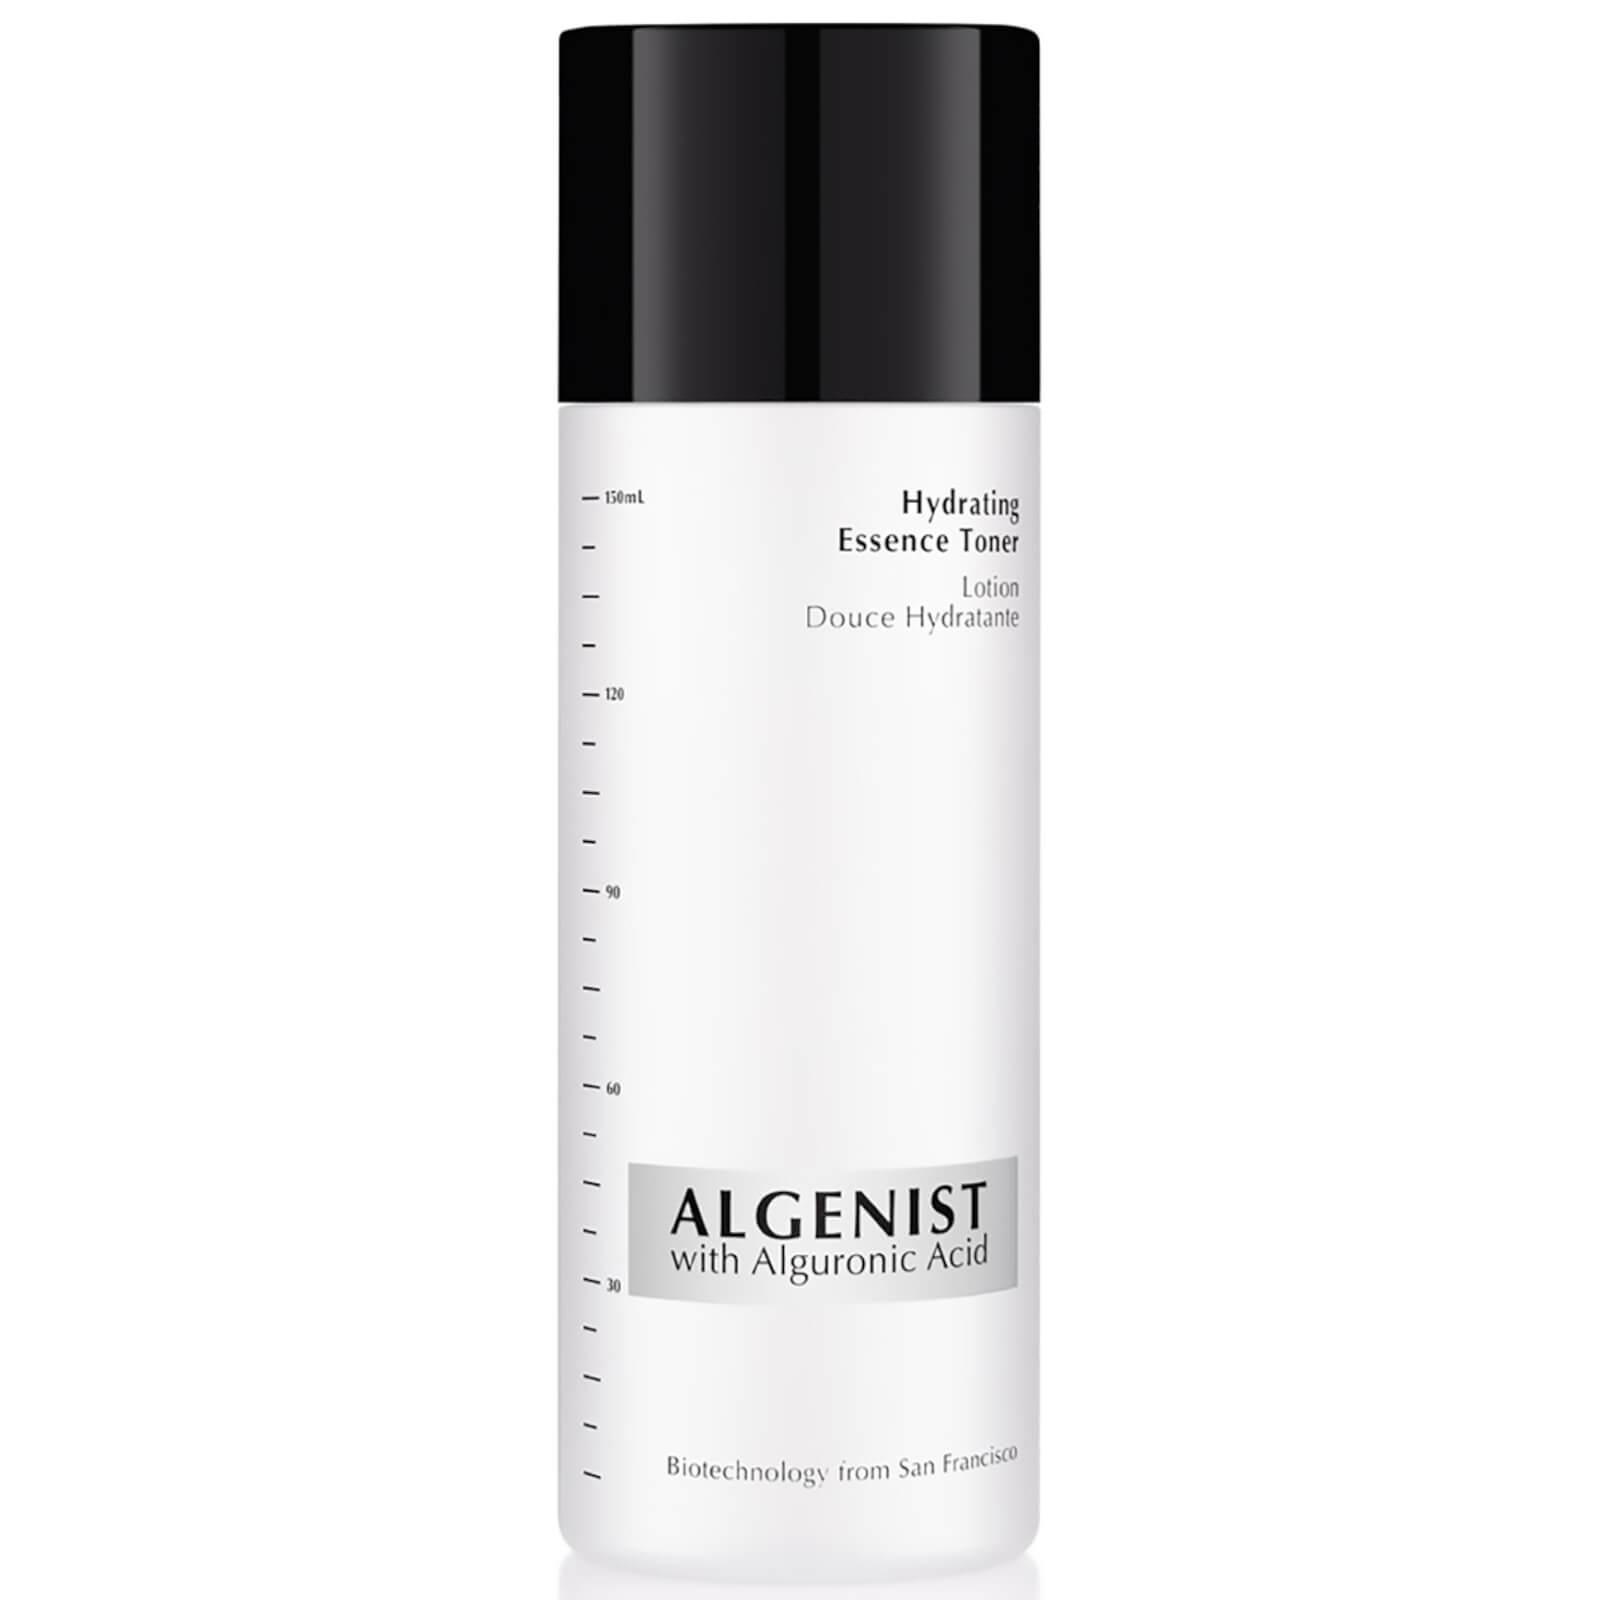 algenist hydrating essence toner 5 fl oz